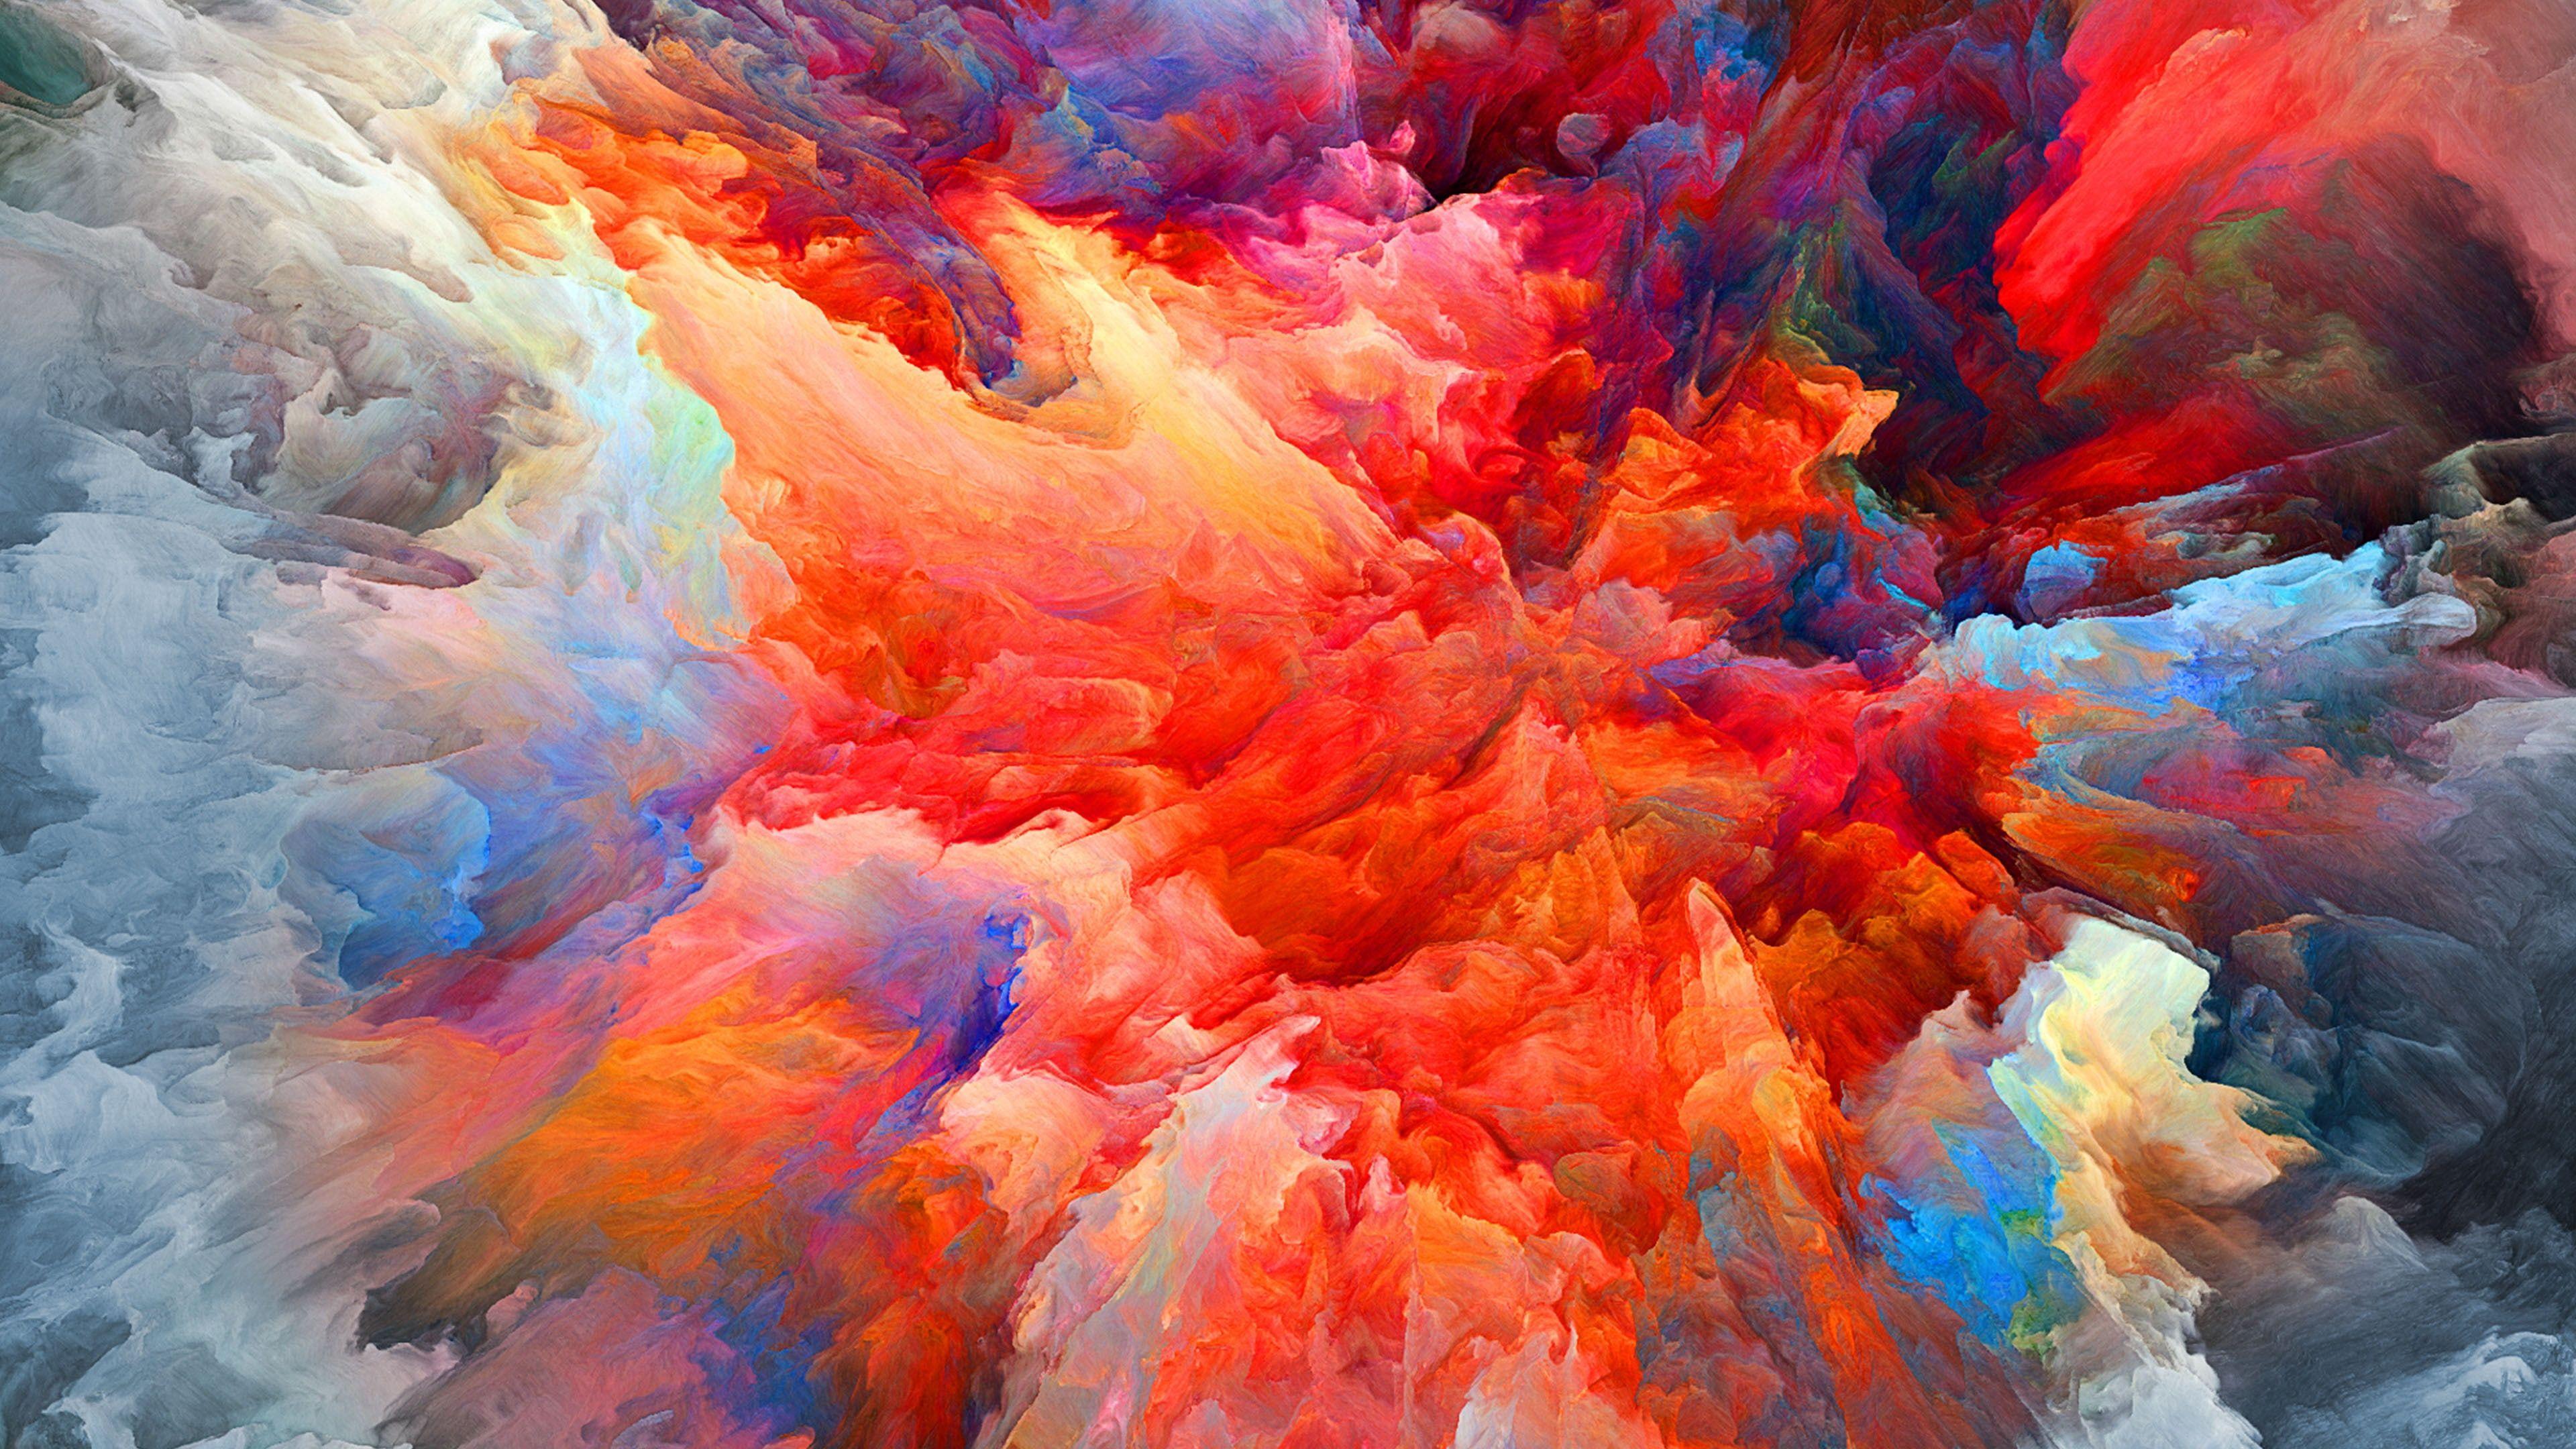 Painting Colors Art Modern Art Sky Paint 4k Wallpaper Hdwallpaper Desktop Painting Wallpaper Painting Colorful Wallpaper